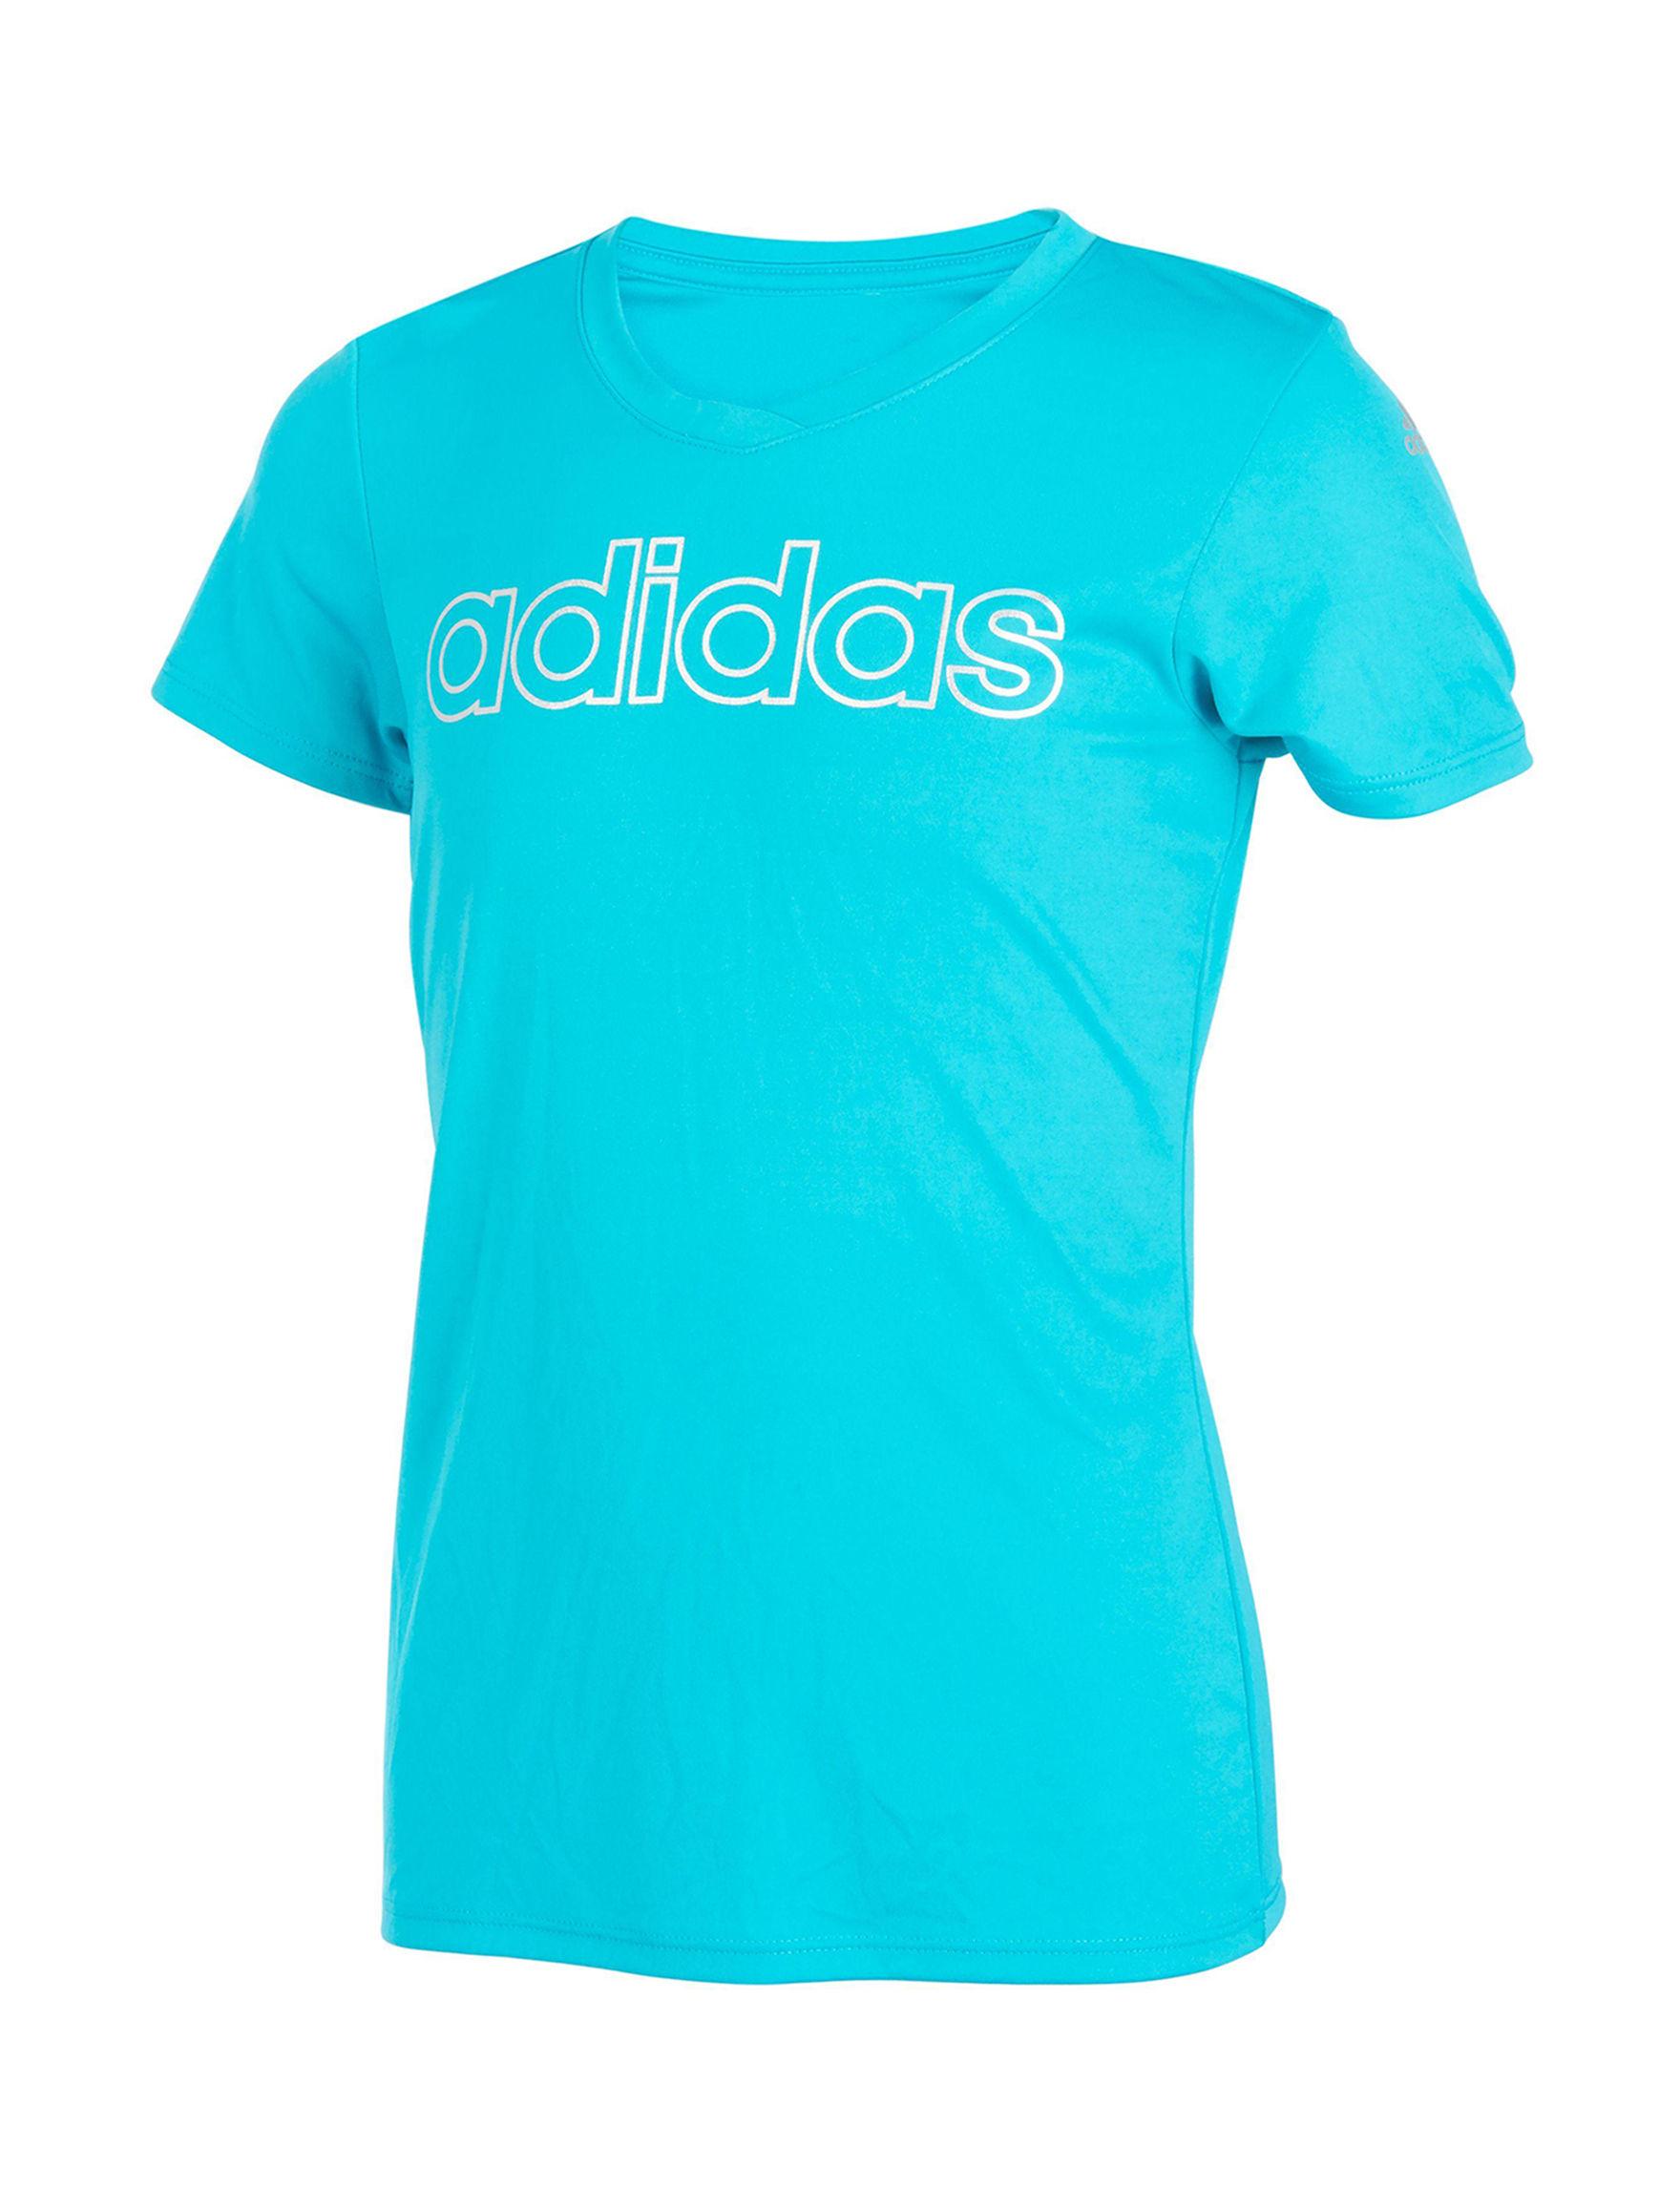 Adidas Aqua Tees & Tanks